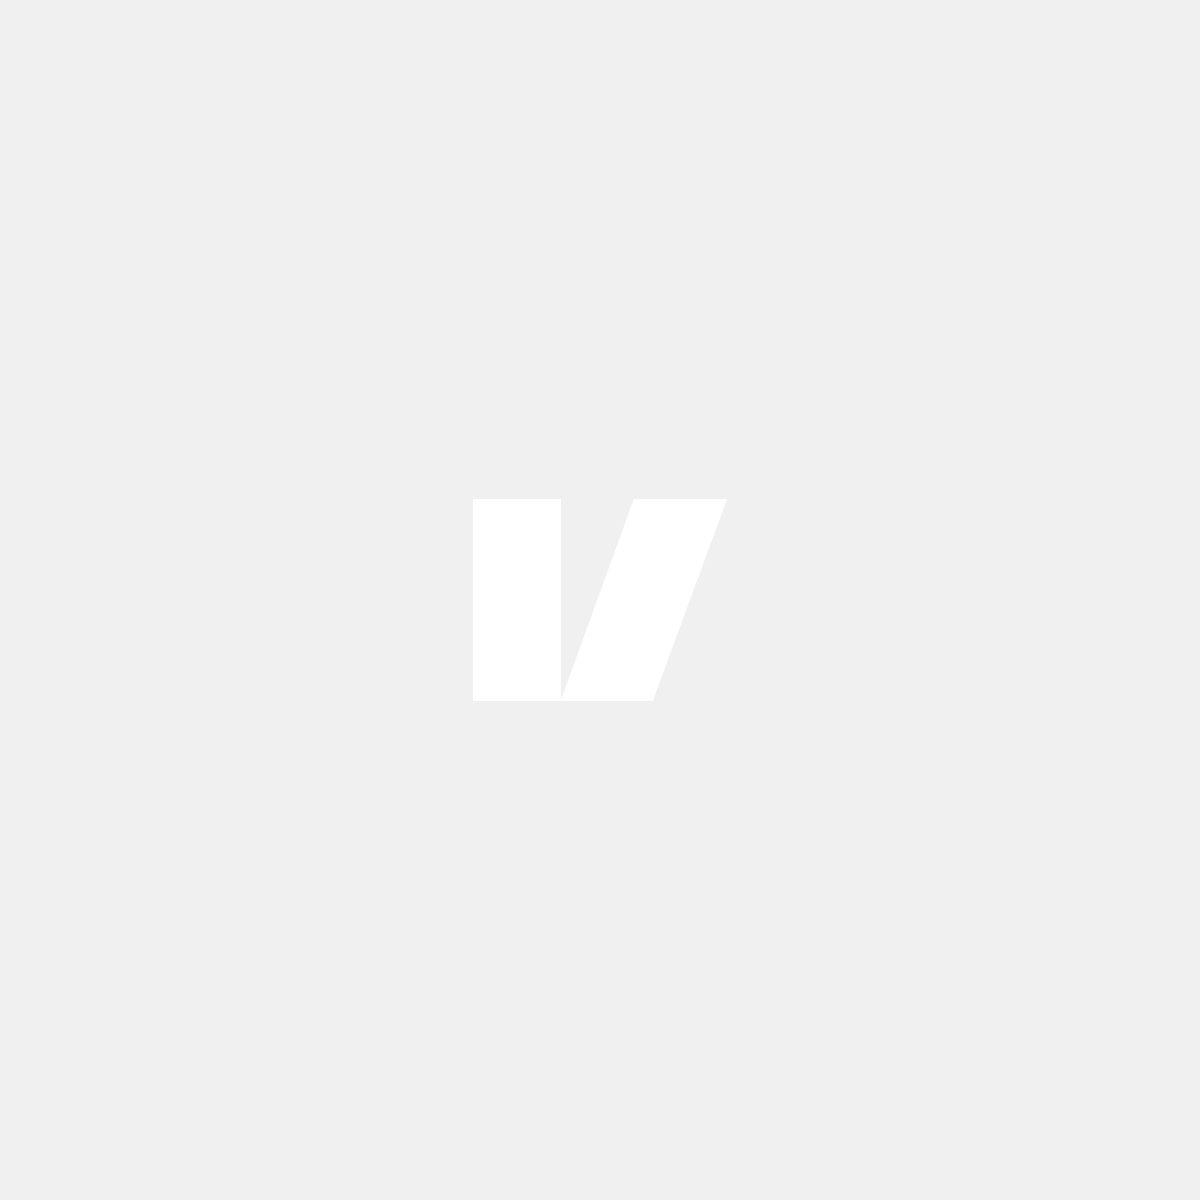 Xenonlampor halvljus till Volvo S80, V50, V70, XC70, XC60, XC90 06-14